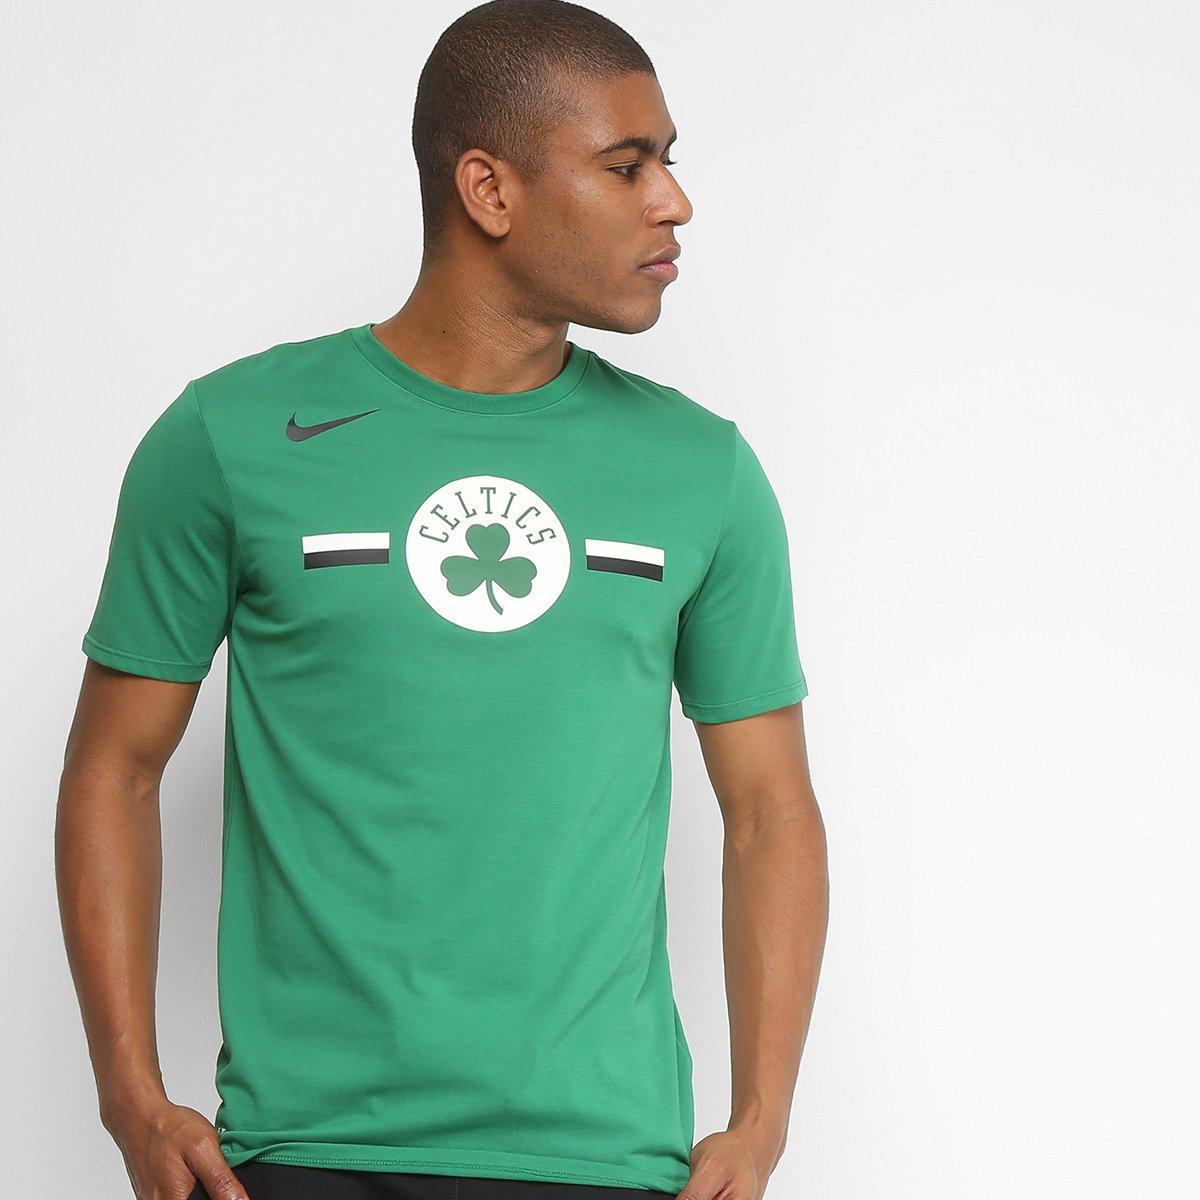 camiseta nba boston celtics nike dry fit logo masculina. Black Bedroom Furniture Sets. Home Design Ideas